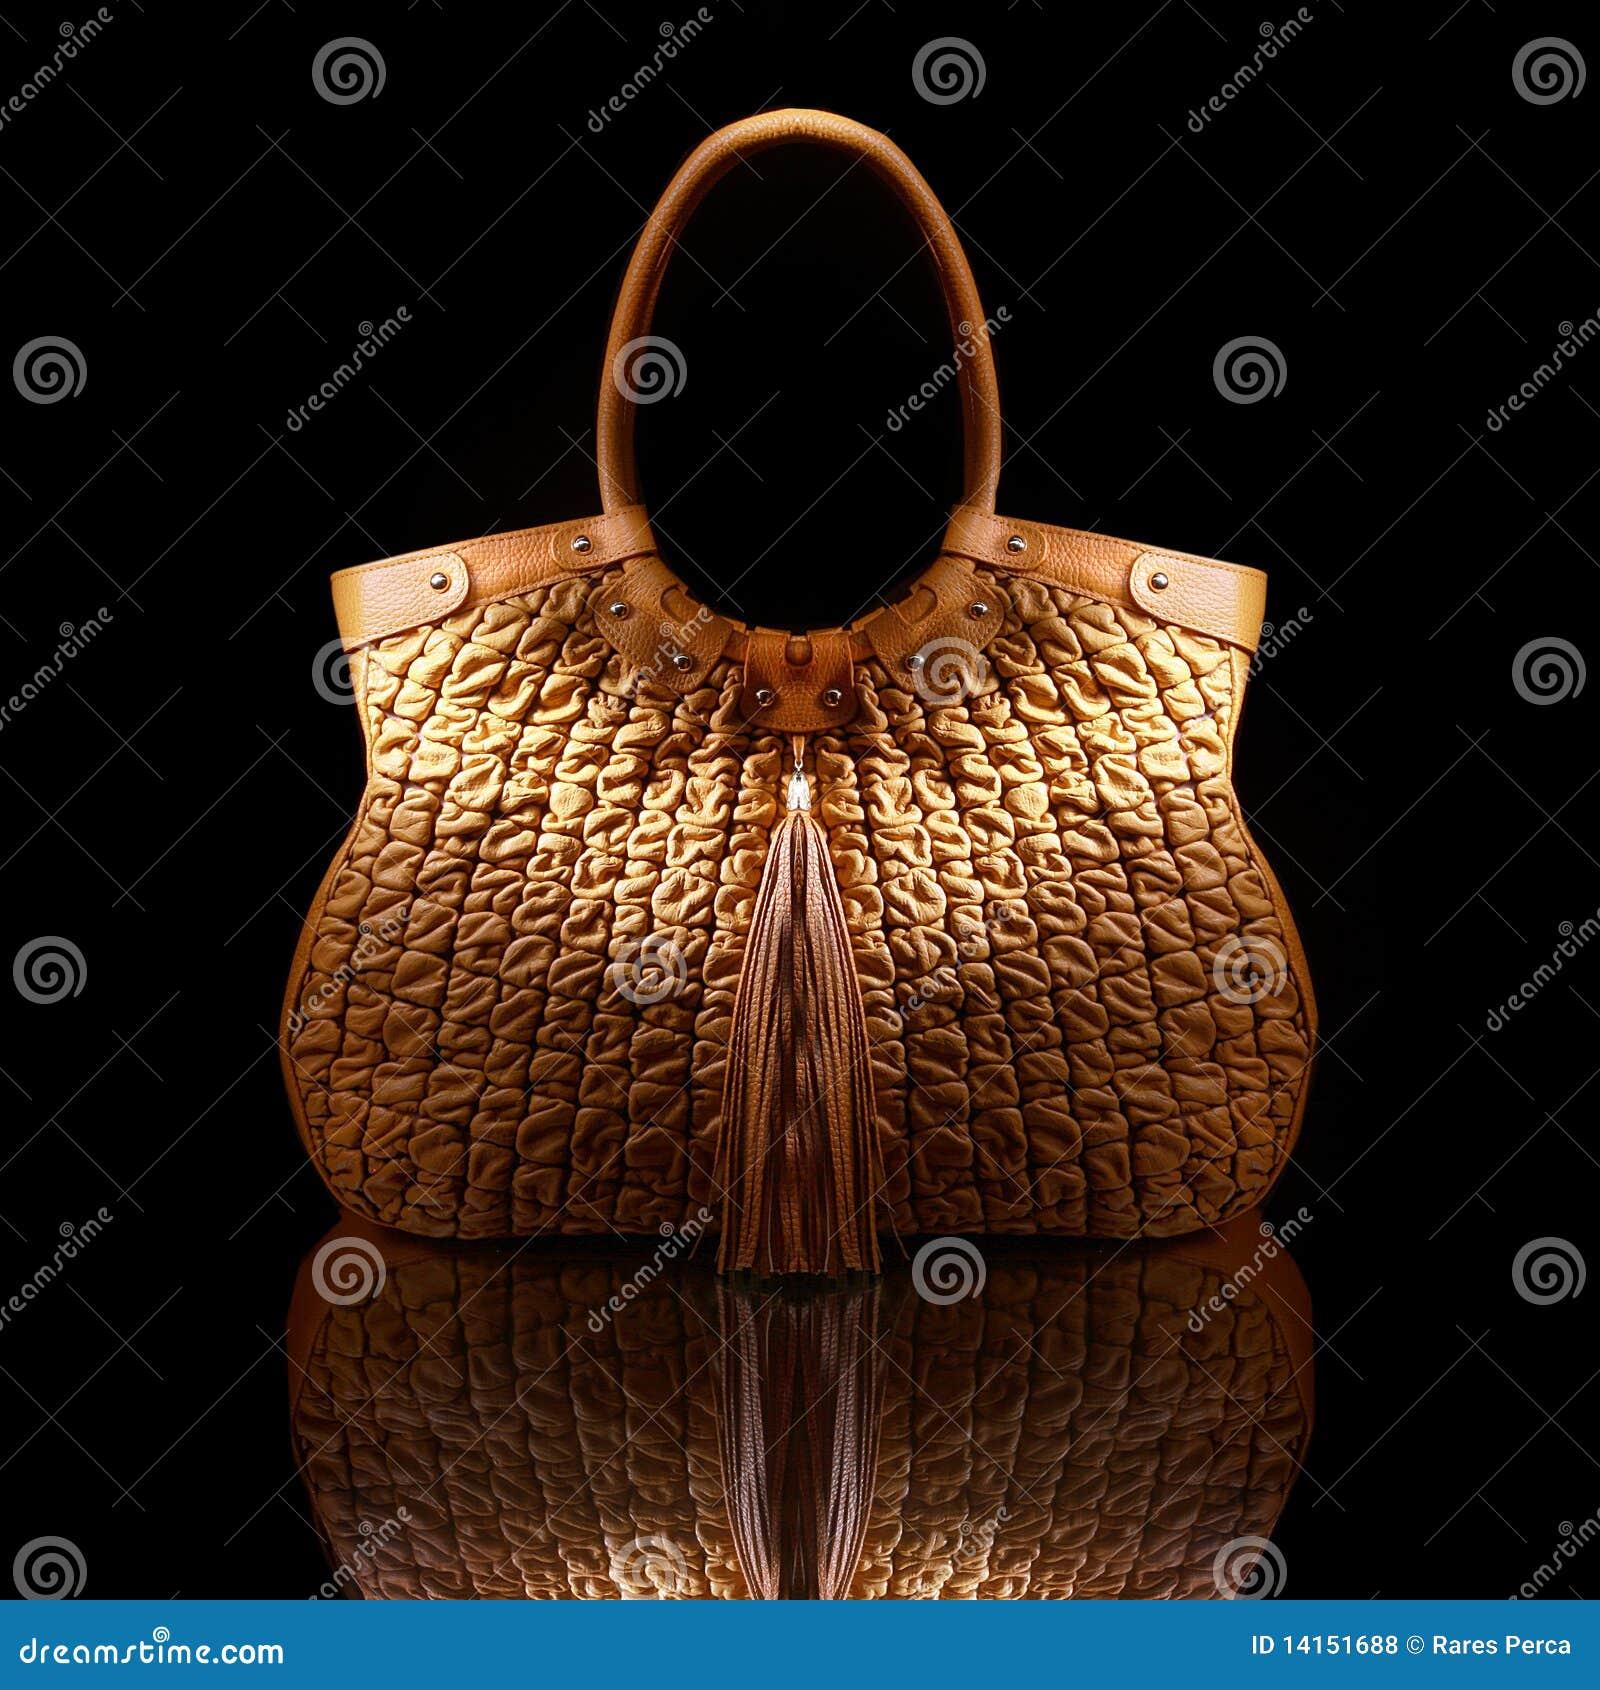 Fashion Accessory Royalty Free Stock Photos Image 14151688